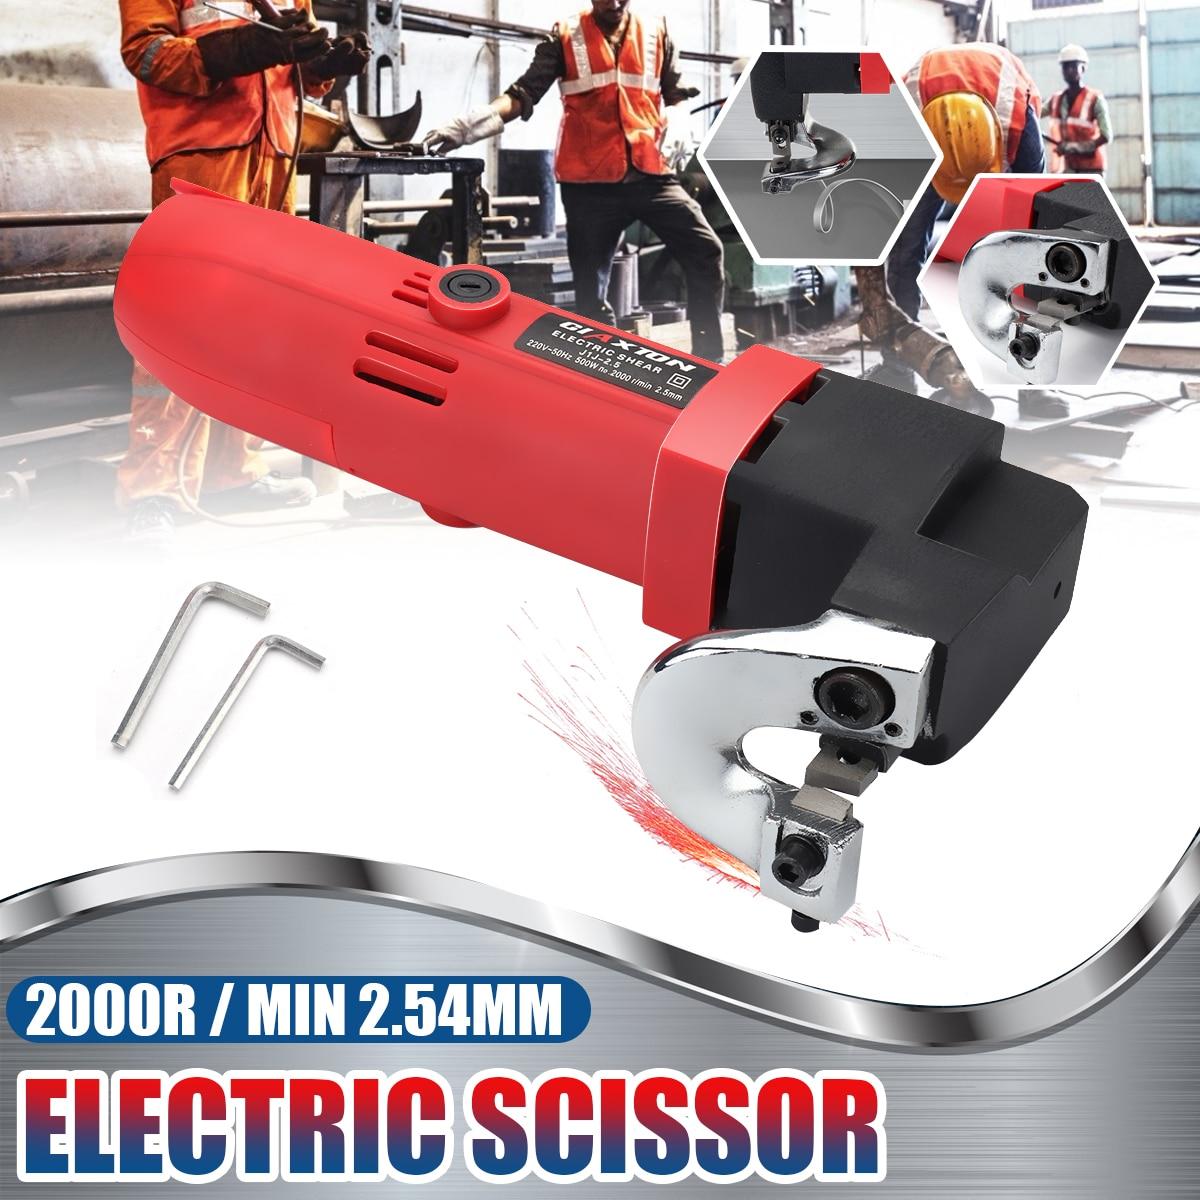 500W 220V 2000r/min EU Plug Professional Electric Sheet Metal Shear Snip Scissor Cutter Power Tool Aluminum Alloy 290x77x145mm